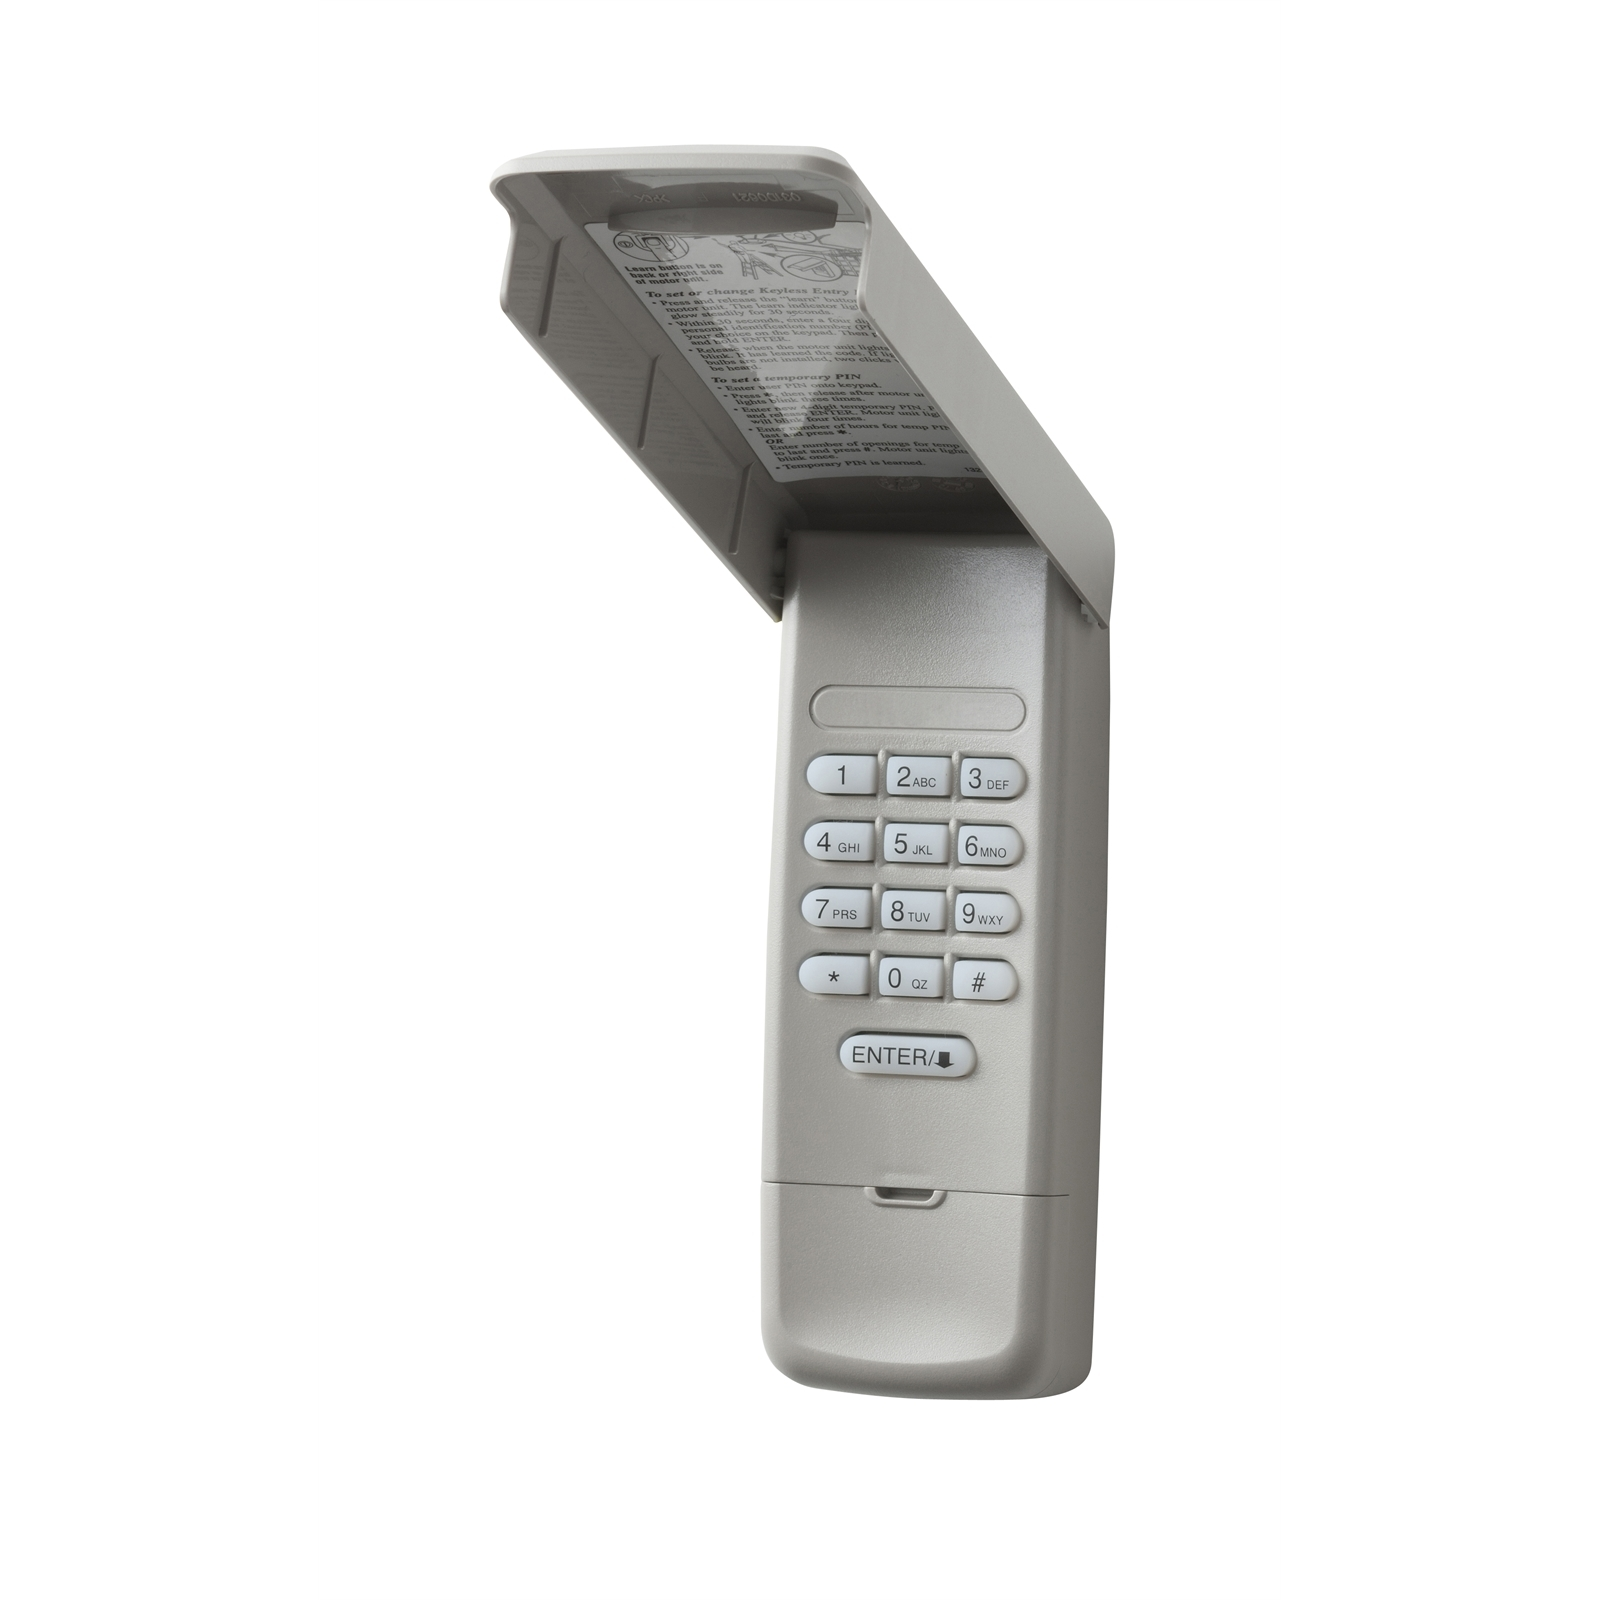 Chamberlain Wireless Keypad For Garage Door Openers